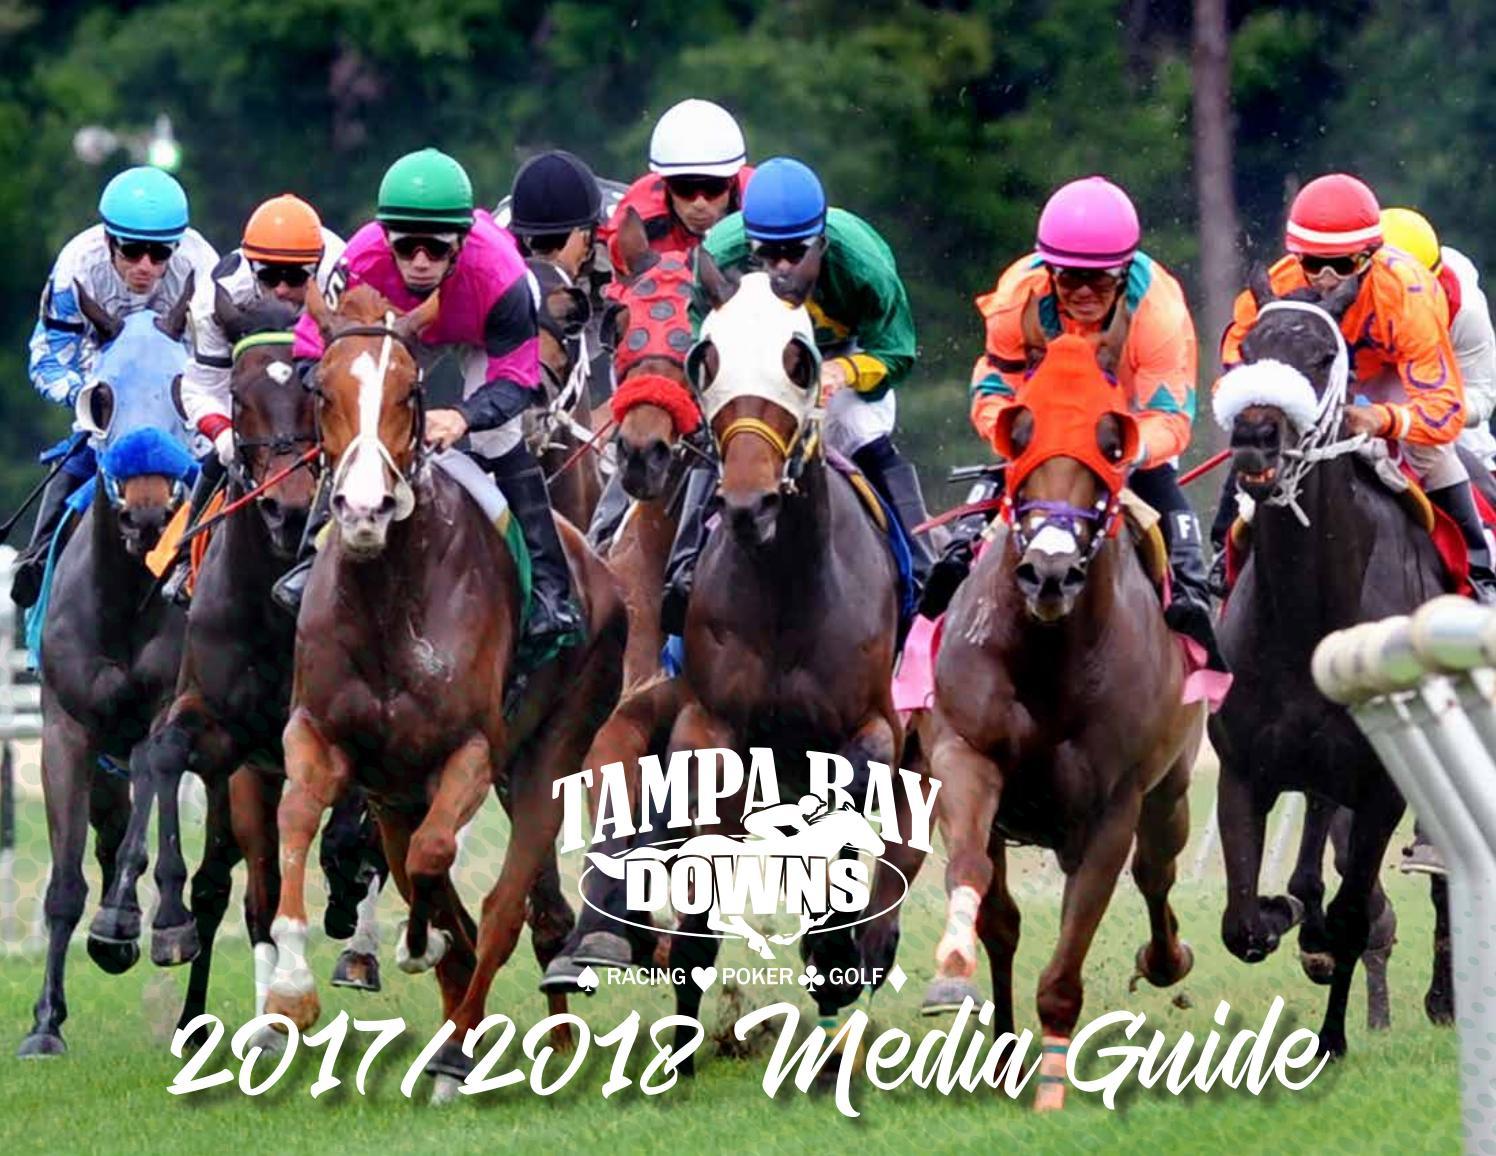 Tampa Bay Downs Race Track Calendar | Printable Calendar Intended For Nc Court Calendar Defendant Name